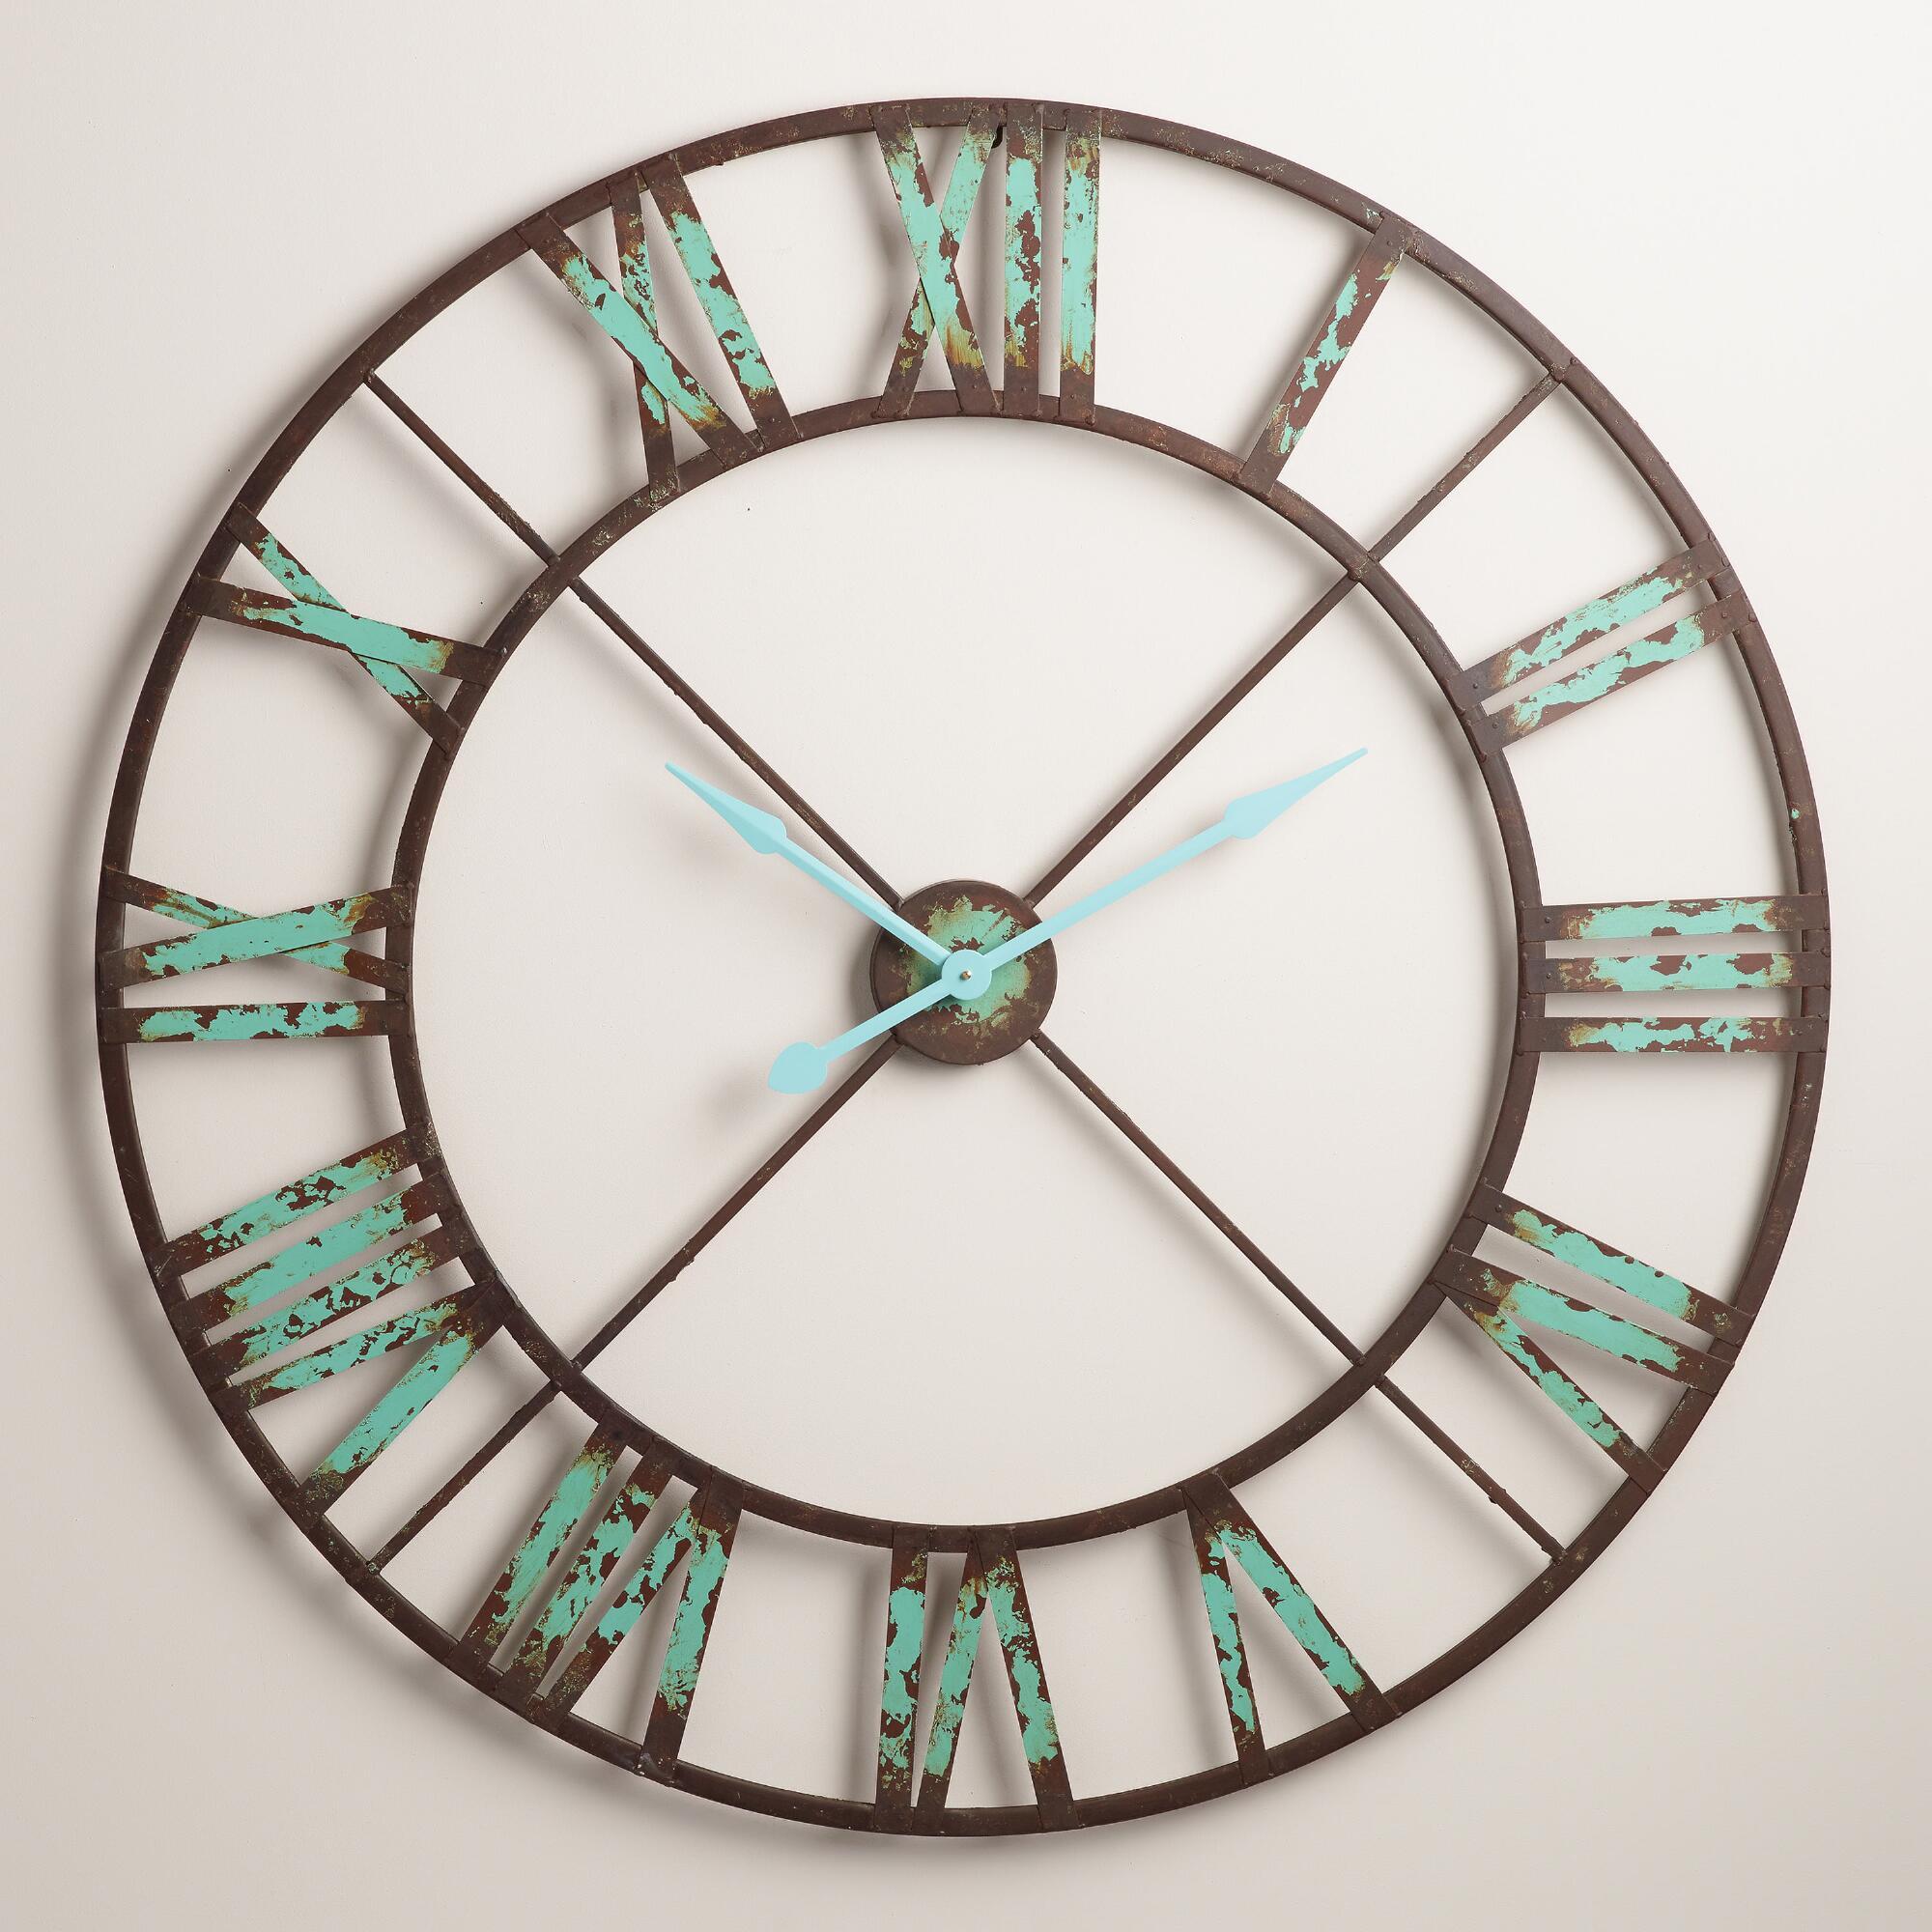 Fullsize Of Wall Clock Industrial